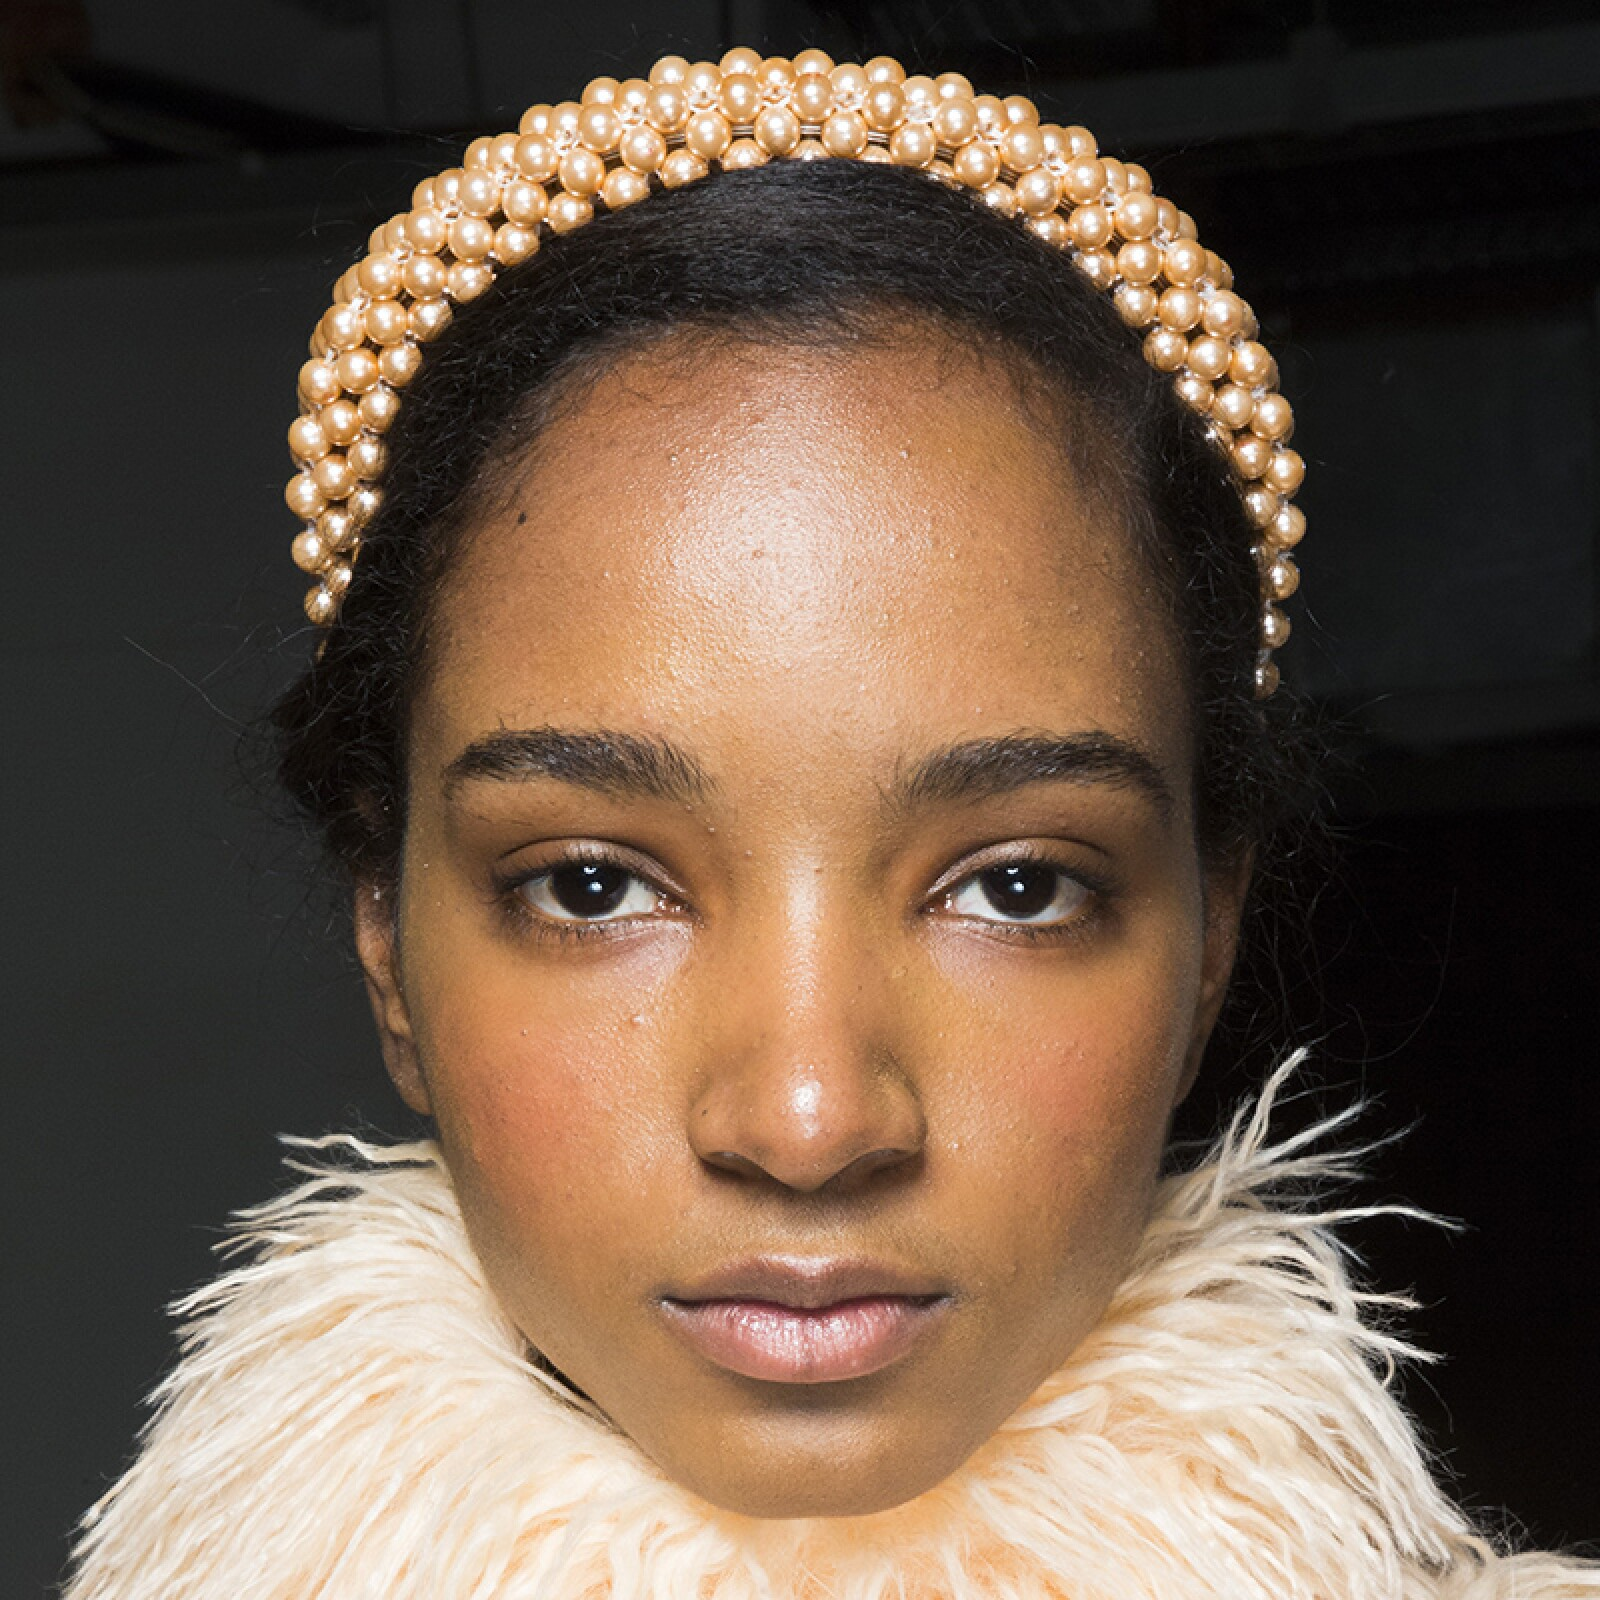 lfw-fashion-week-runway-beauty-looks-maquillaje-shrimps